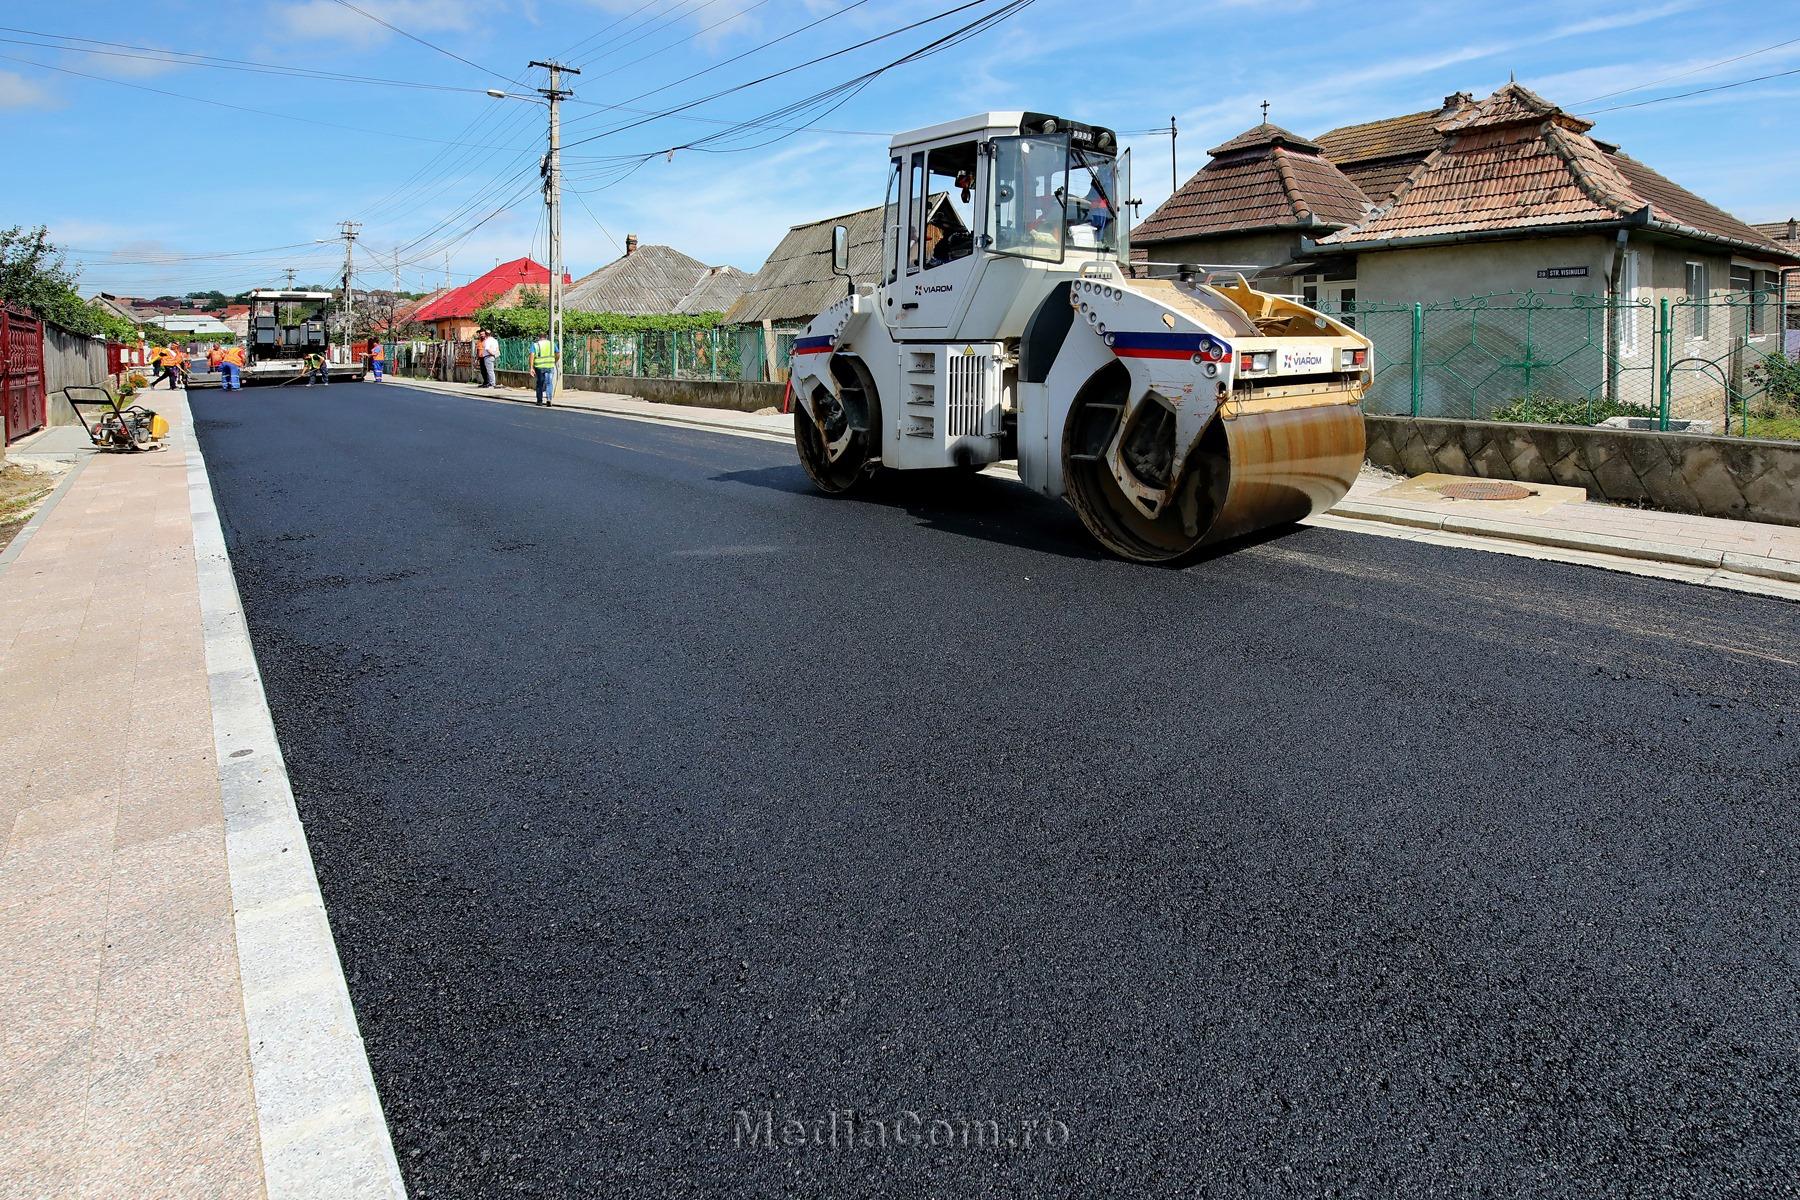 Agentia Cluj continua lucrarile in Turda